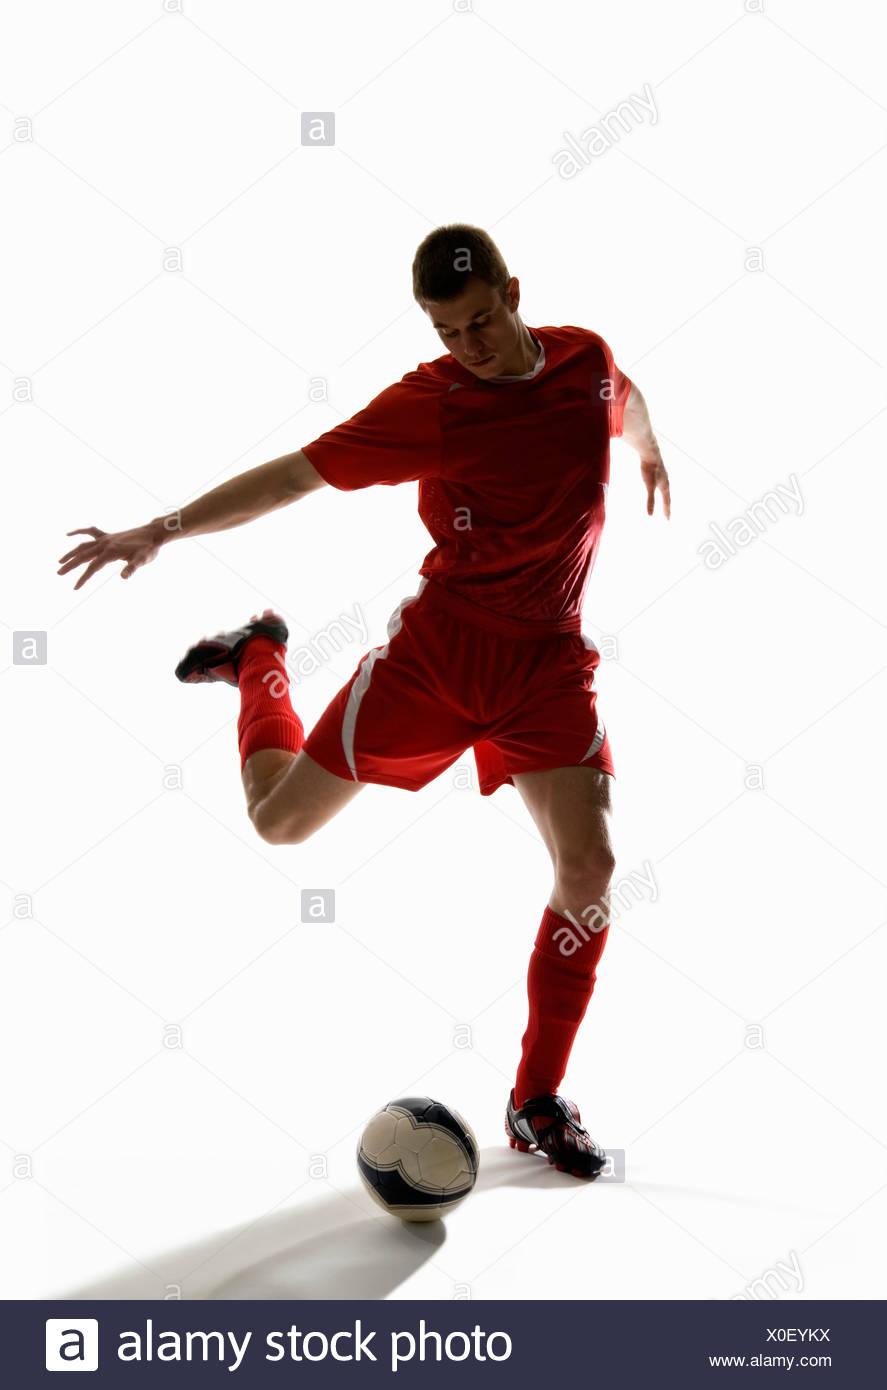 Studio shot of a soccer player kicking a soccer ball - Stock Image